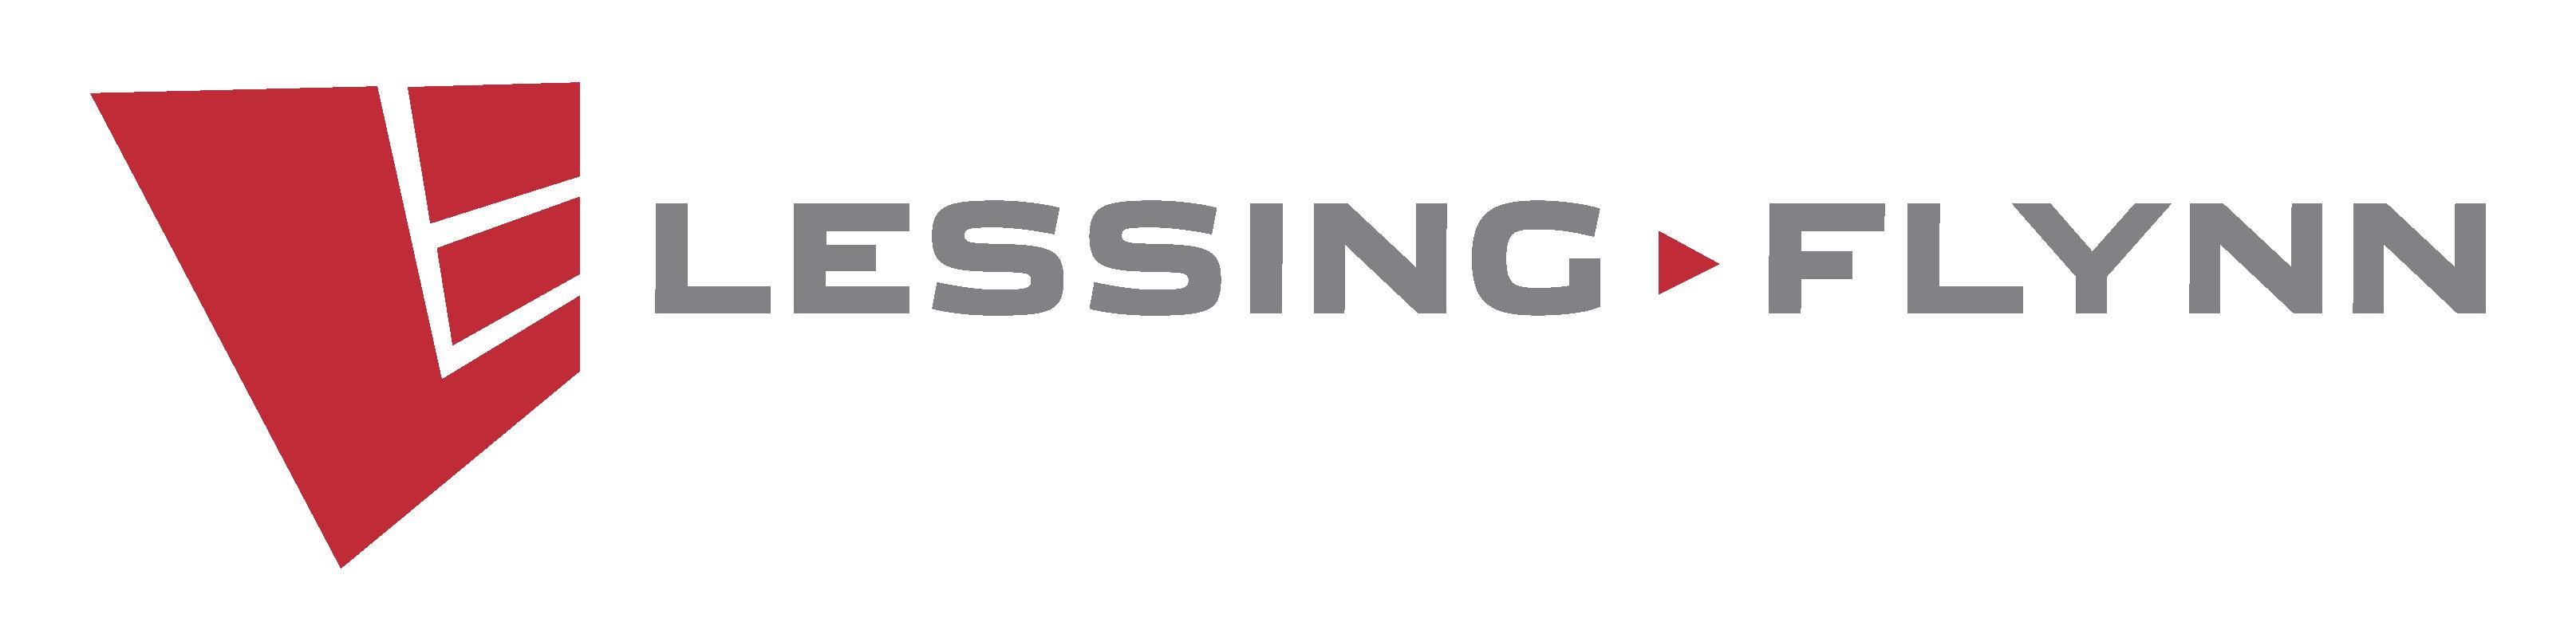 Lessing-Flynn Company Logo